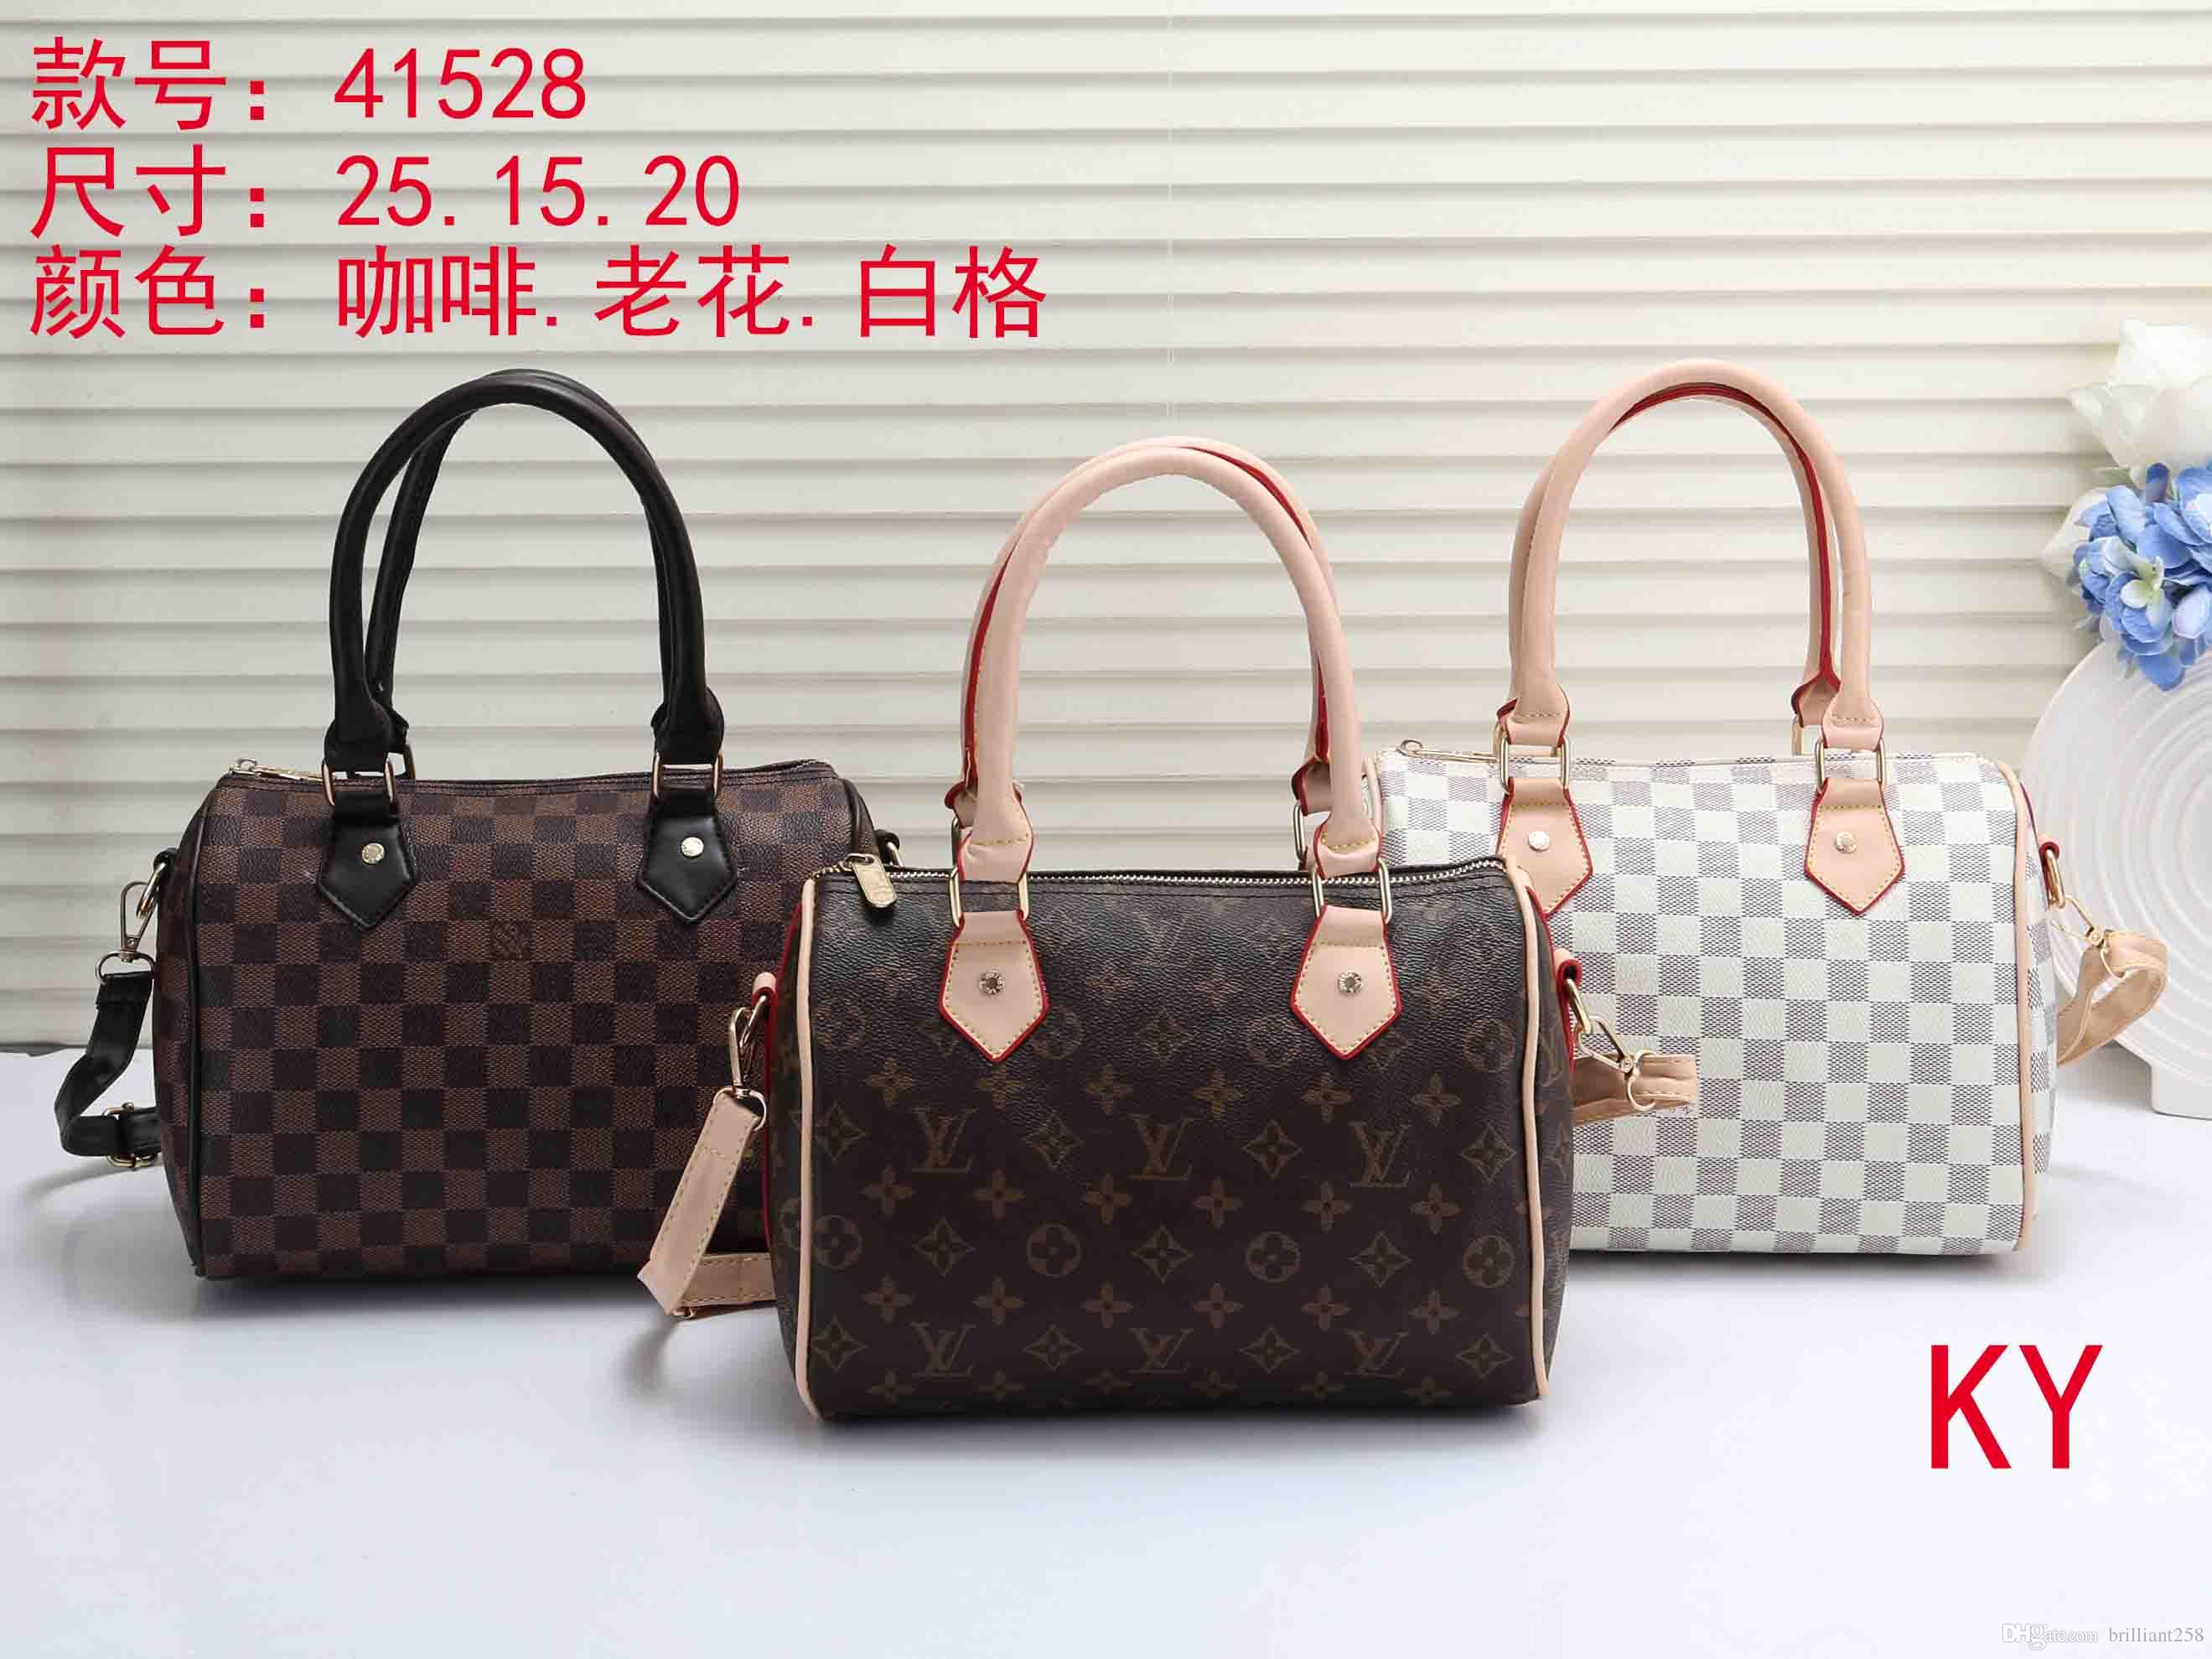 2019 Styles Handbag M Famous Designer Brand Name Fashion Leather Handbags  Women Tote Shoulder Bags Lady Leather Handbags Bags Purse L41528 Leather  Satchel ... dac96b3656b93